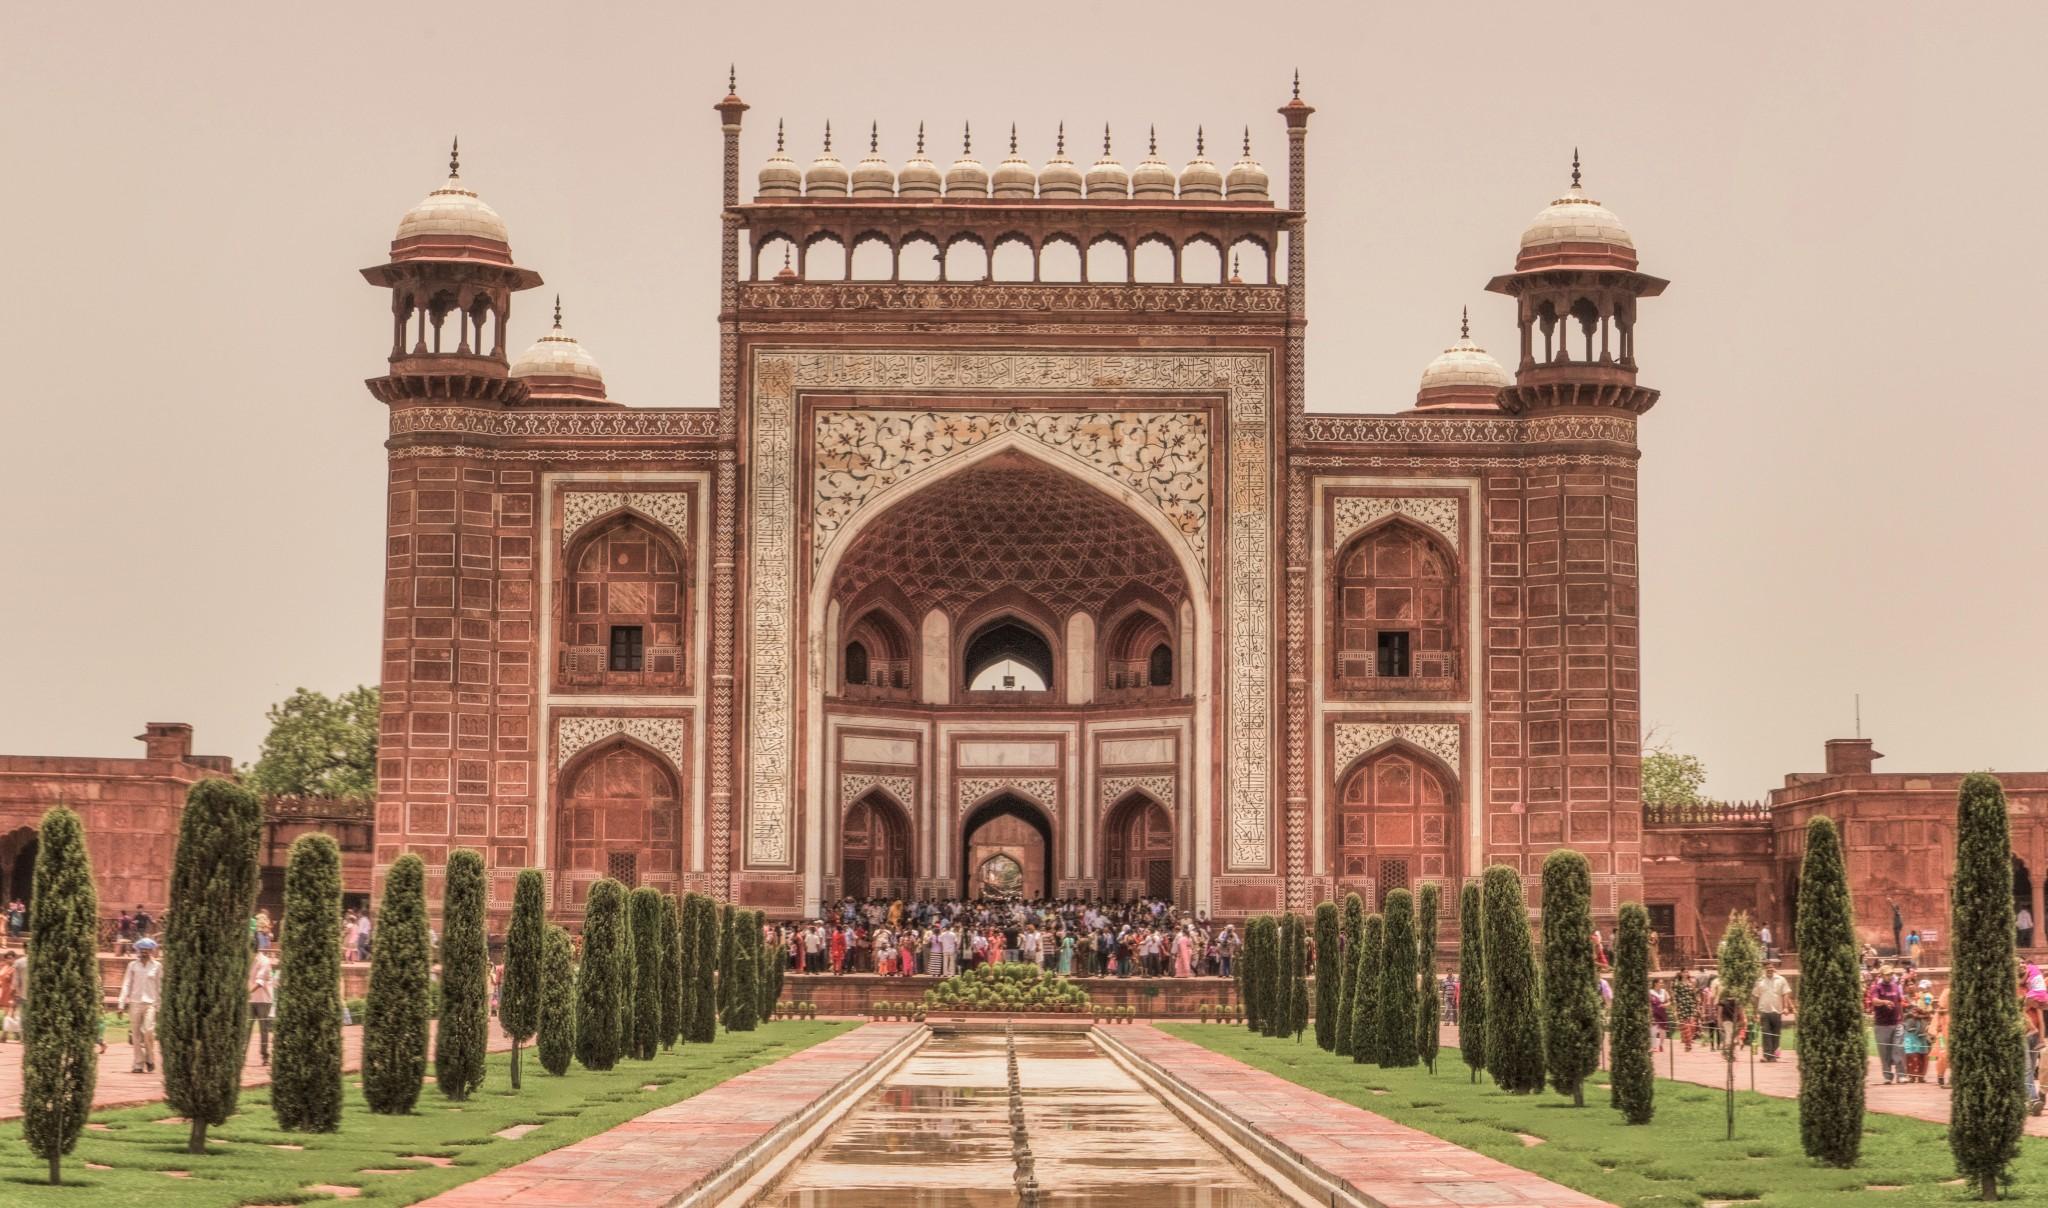 Taj Mahal Agra India – History, Architecture, Facts, Myths, Visit ...